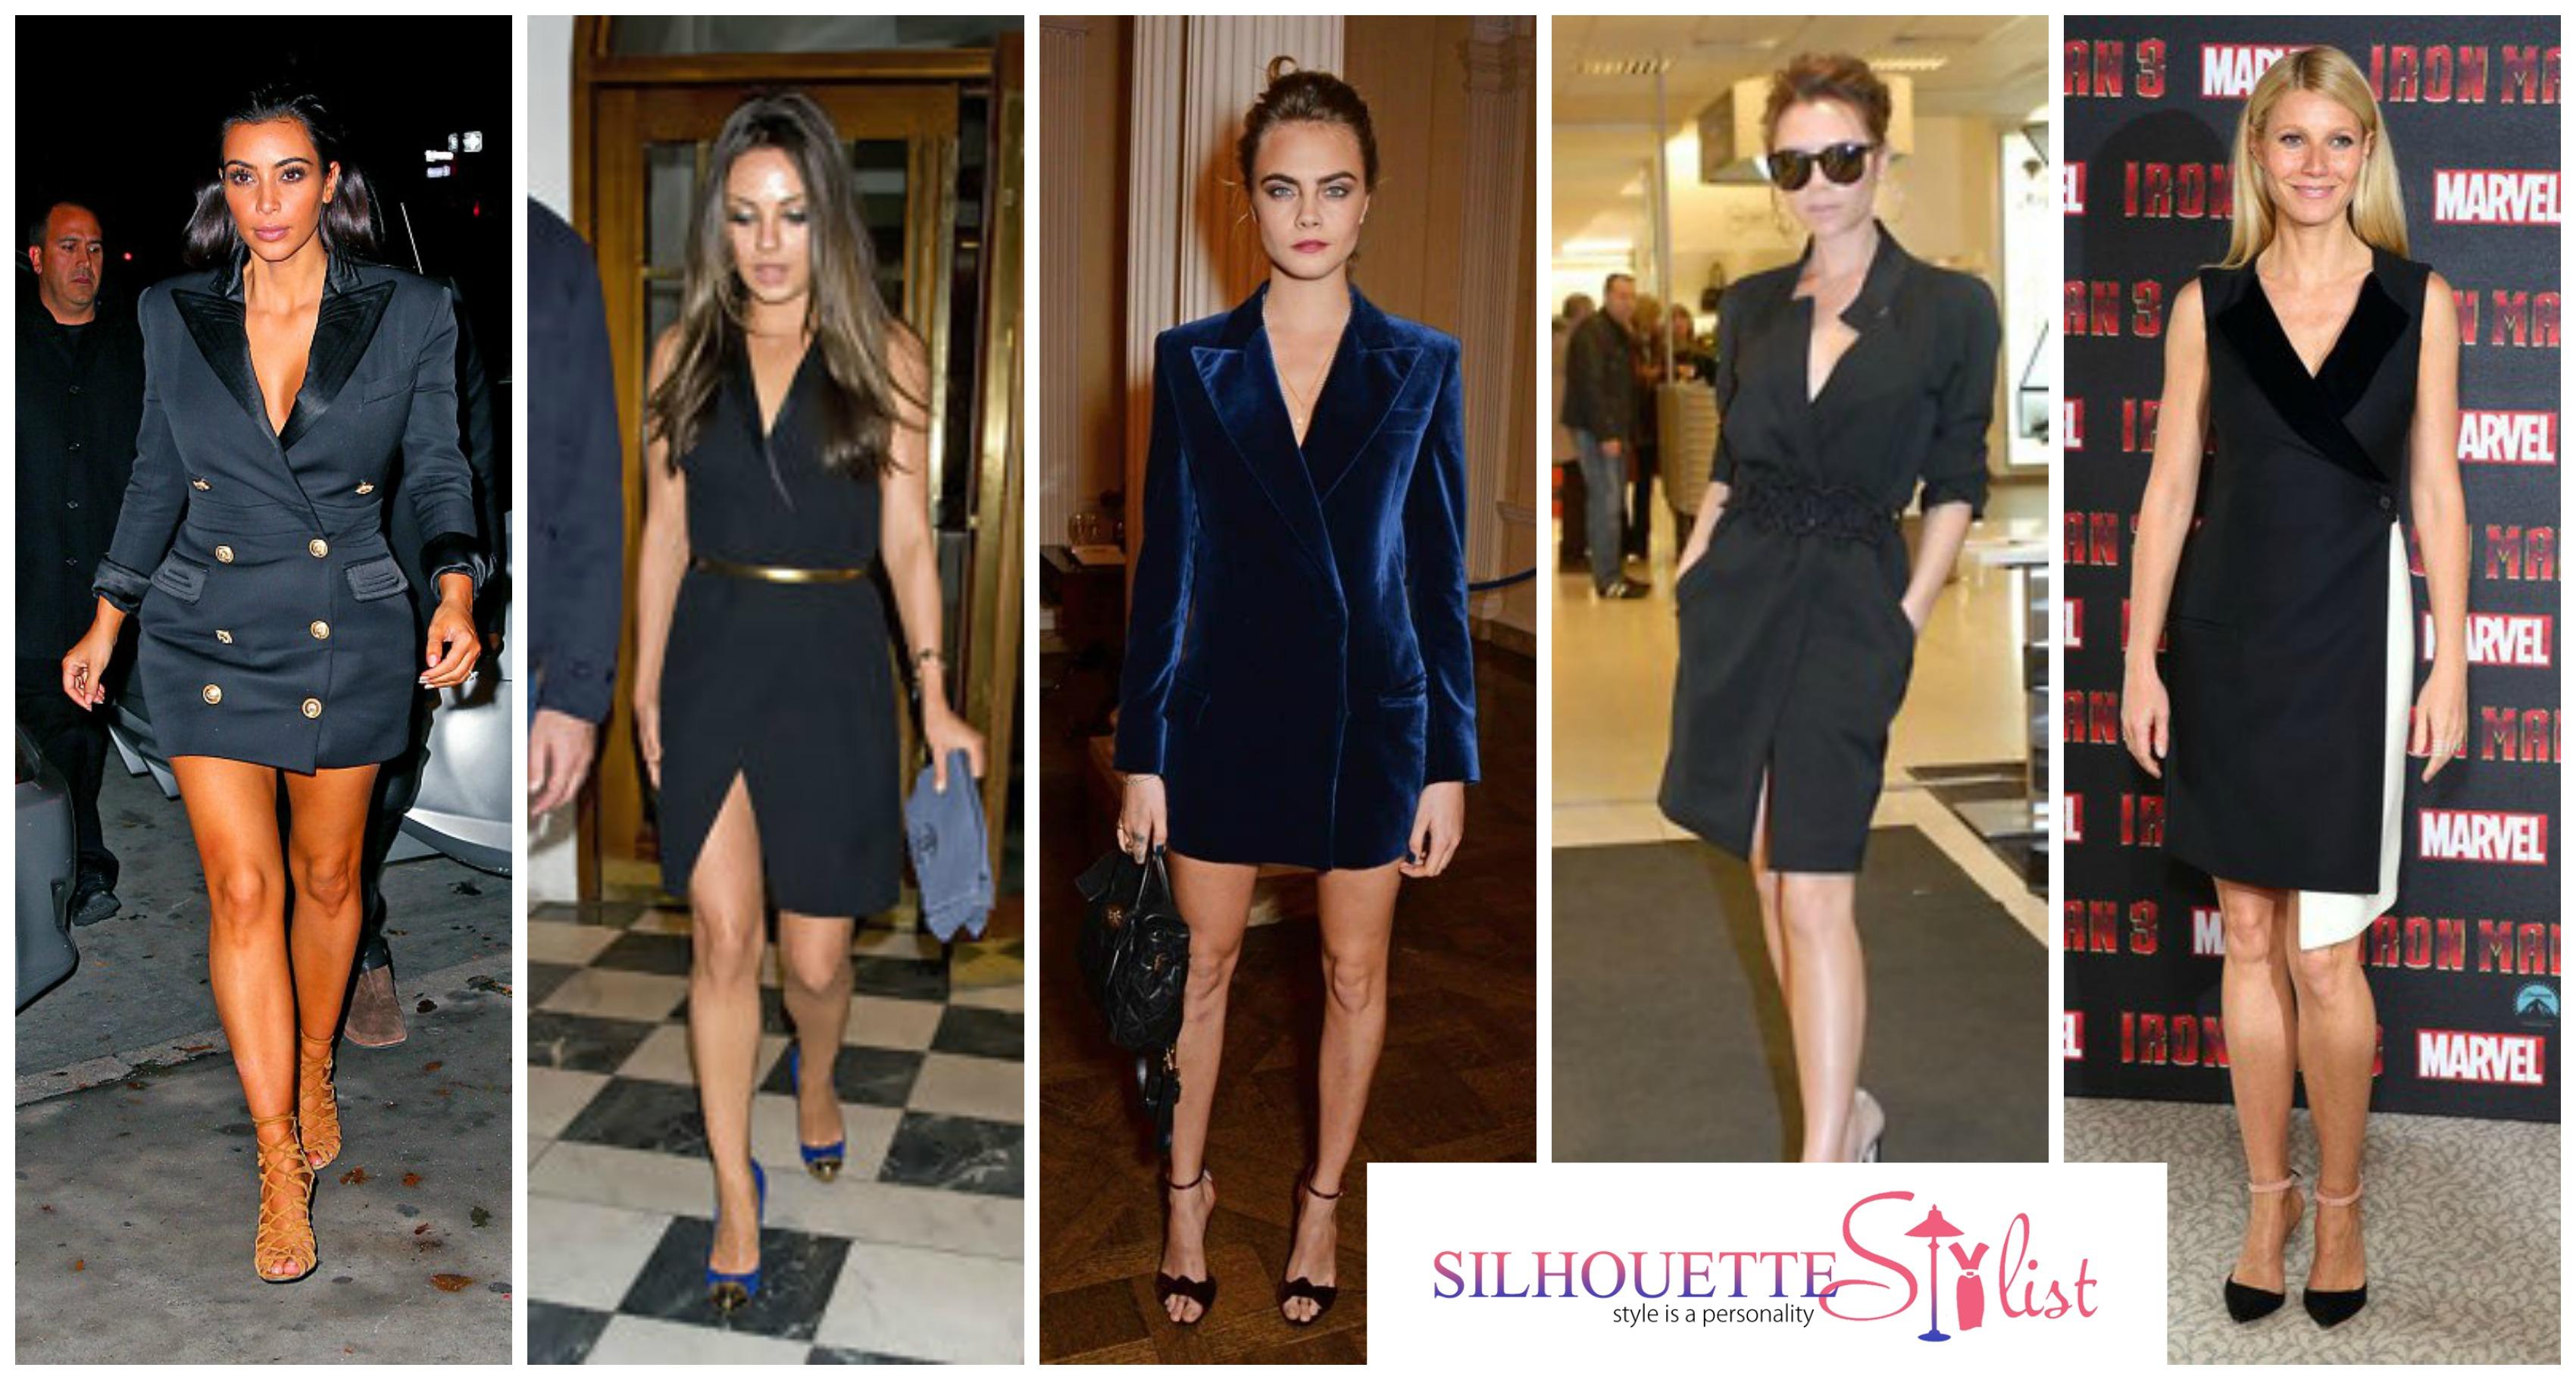 04da3b28f4f1 Blazer Dress - Kim Kardashian, Mila Kunis, Cara Delevigne, Victoria  Beckham, Gwyneth. Are you convinced on this style?